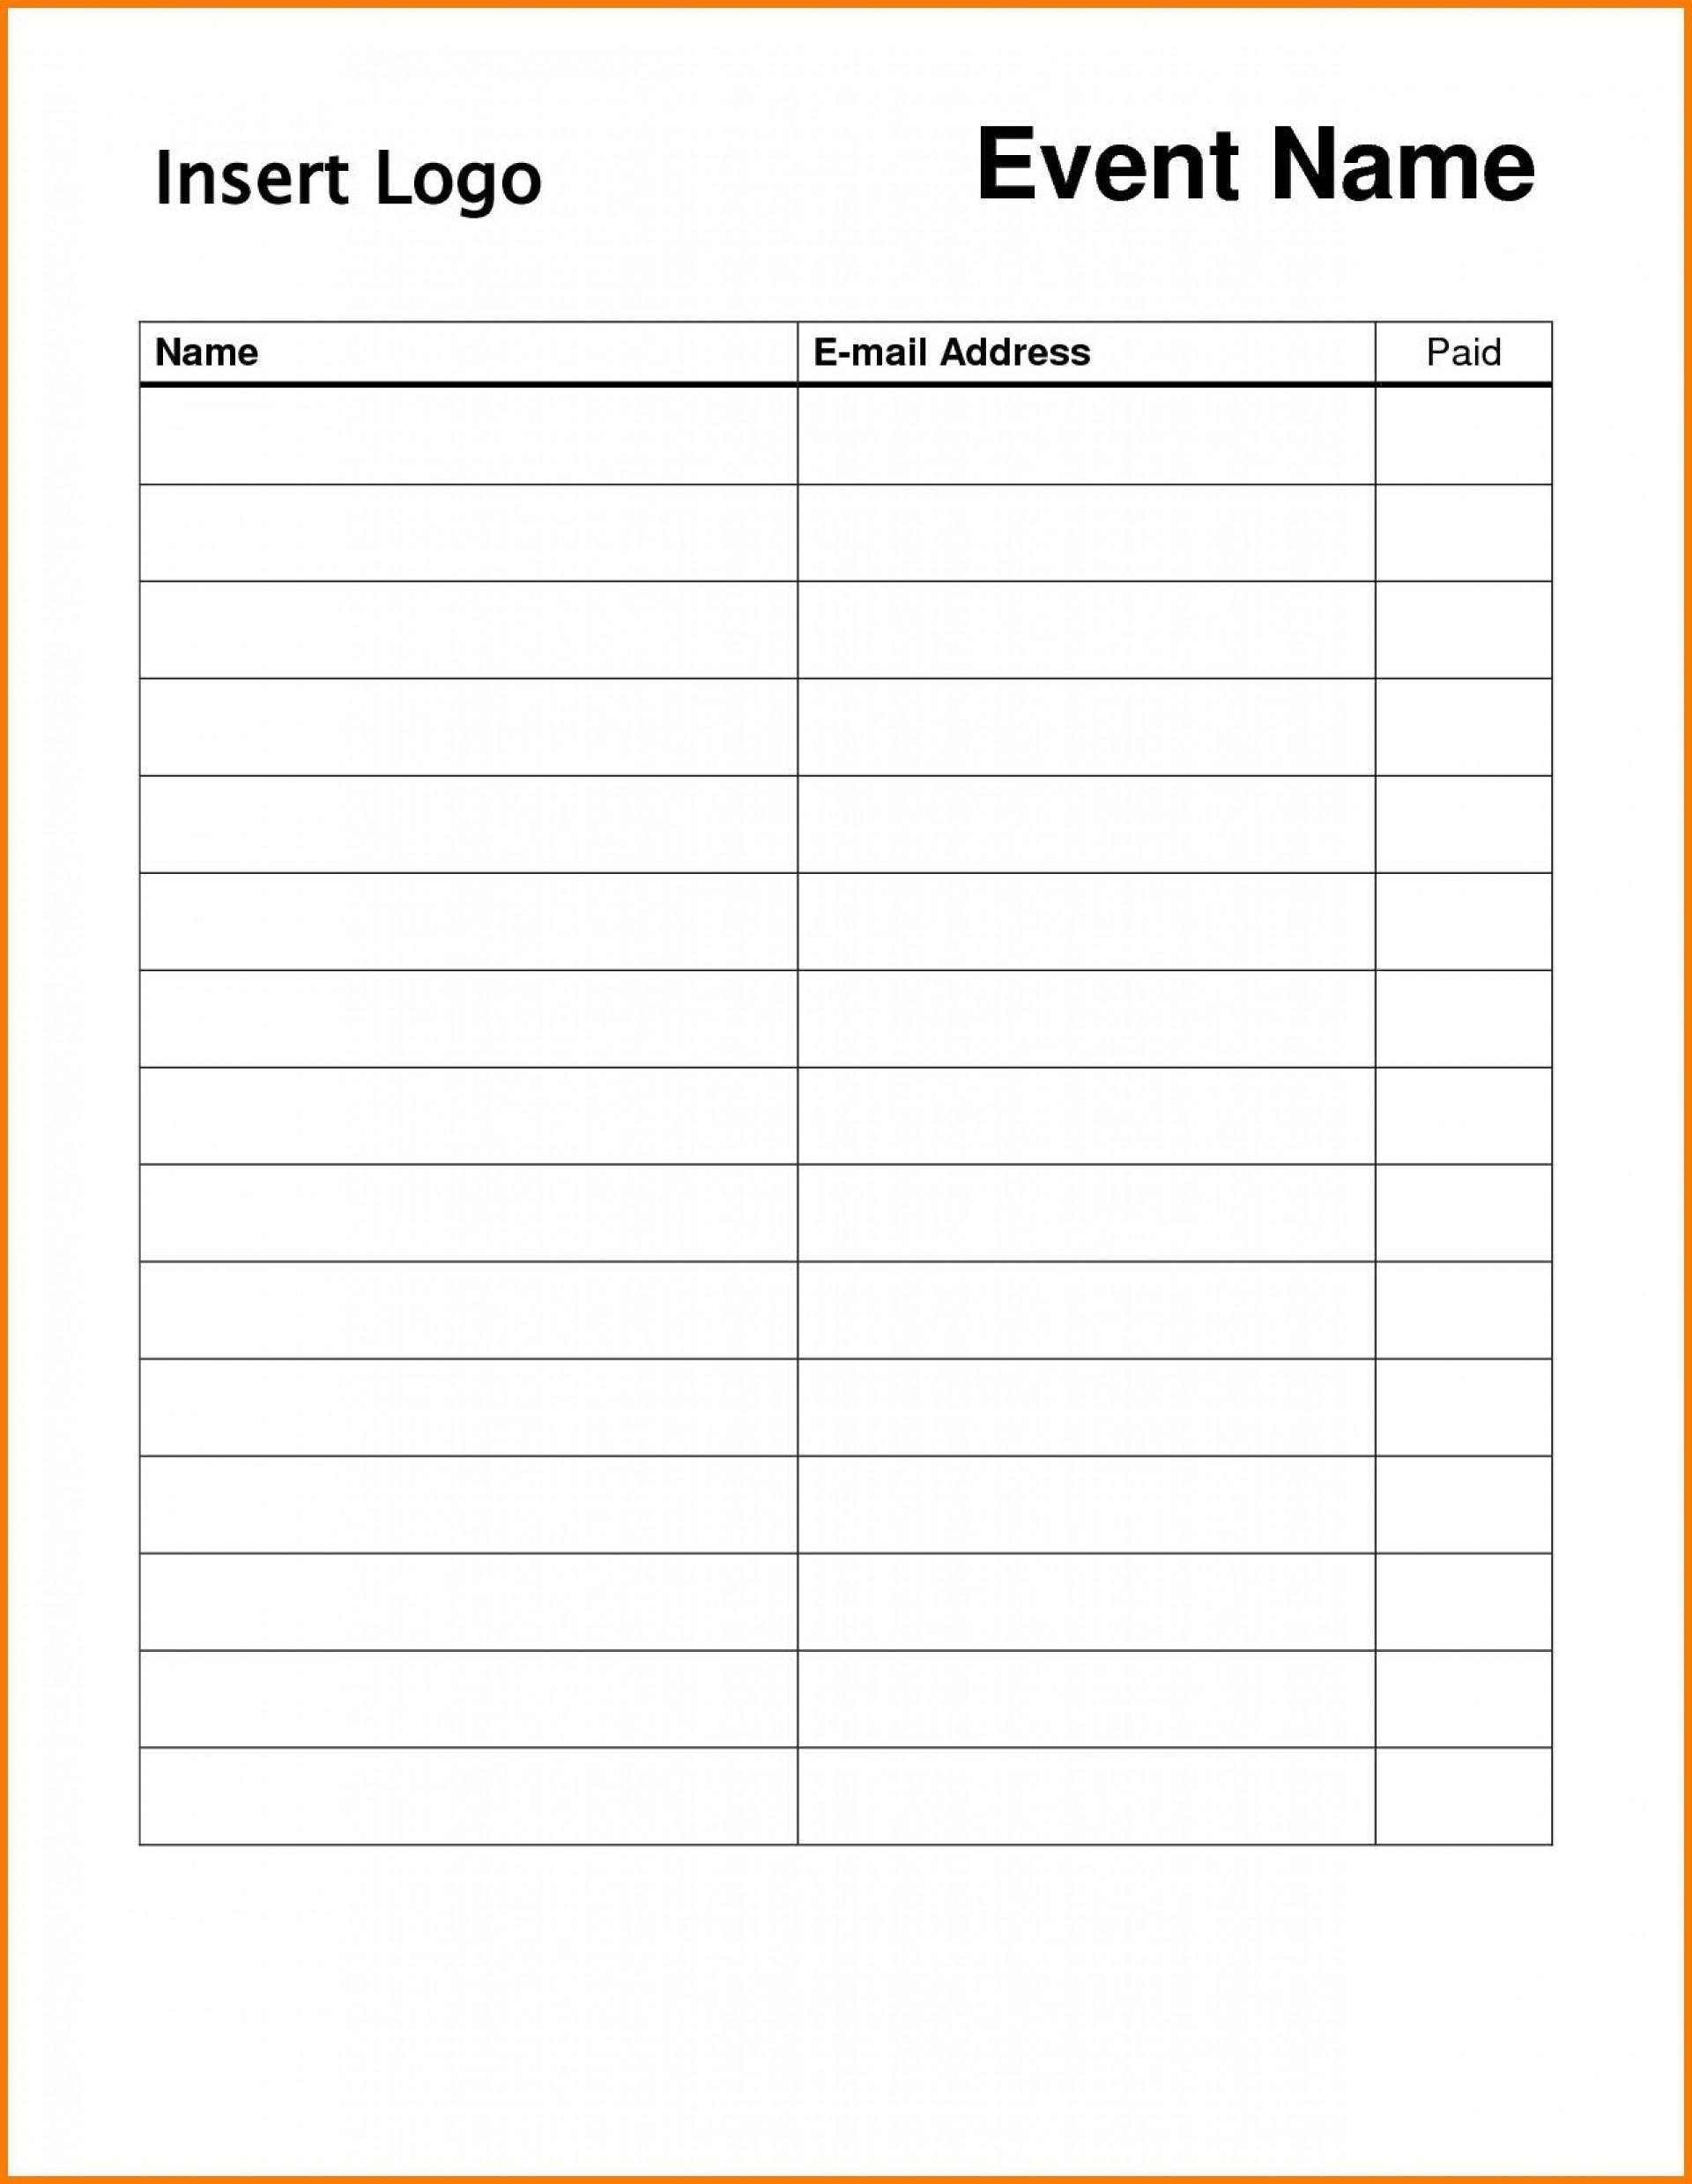 009 Surprising Free Sign Up Sheet Template Photo  Printable Potluck Word Blank Google Doc1920